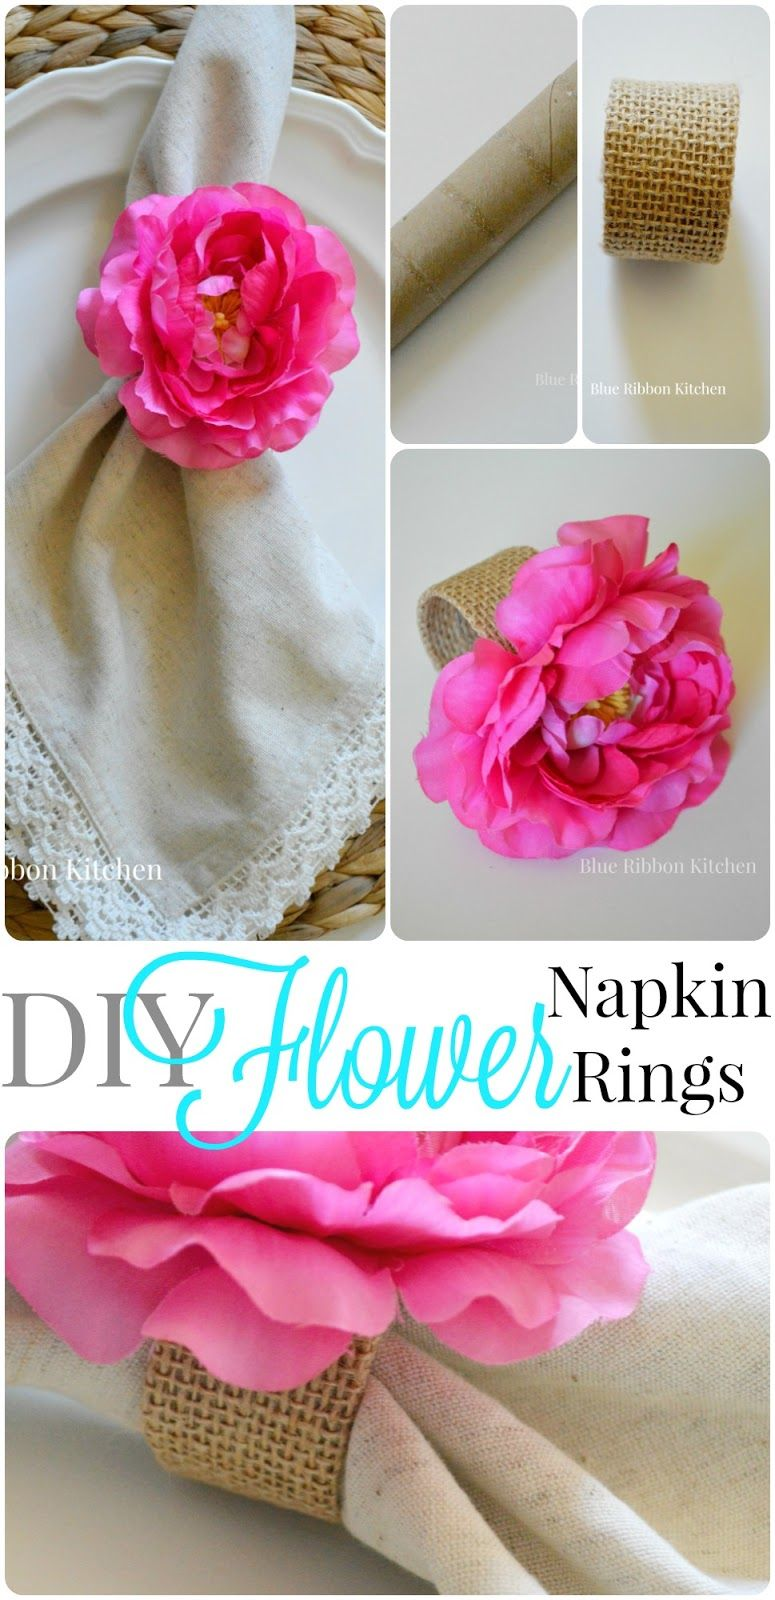 Blue Ribbon Kitchen: Easy DIY Flower Napkin Rings | DIY Rock Stars ...